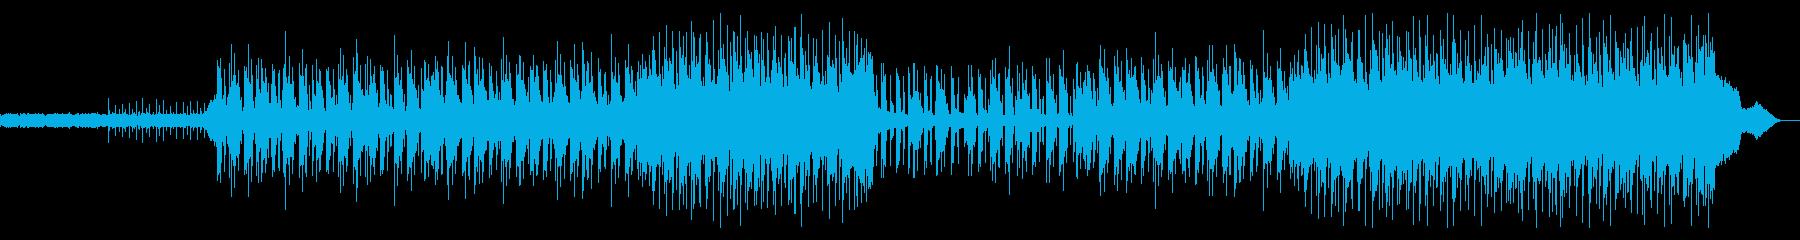 HIPHOPトラック/怪しい雰囲気が漂うの再生済みの波形